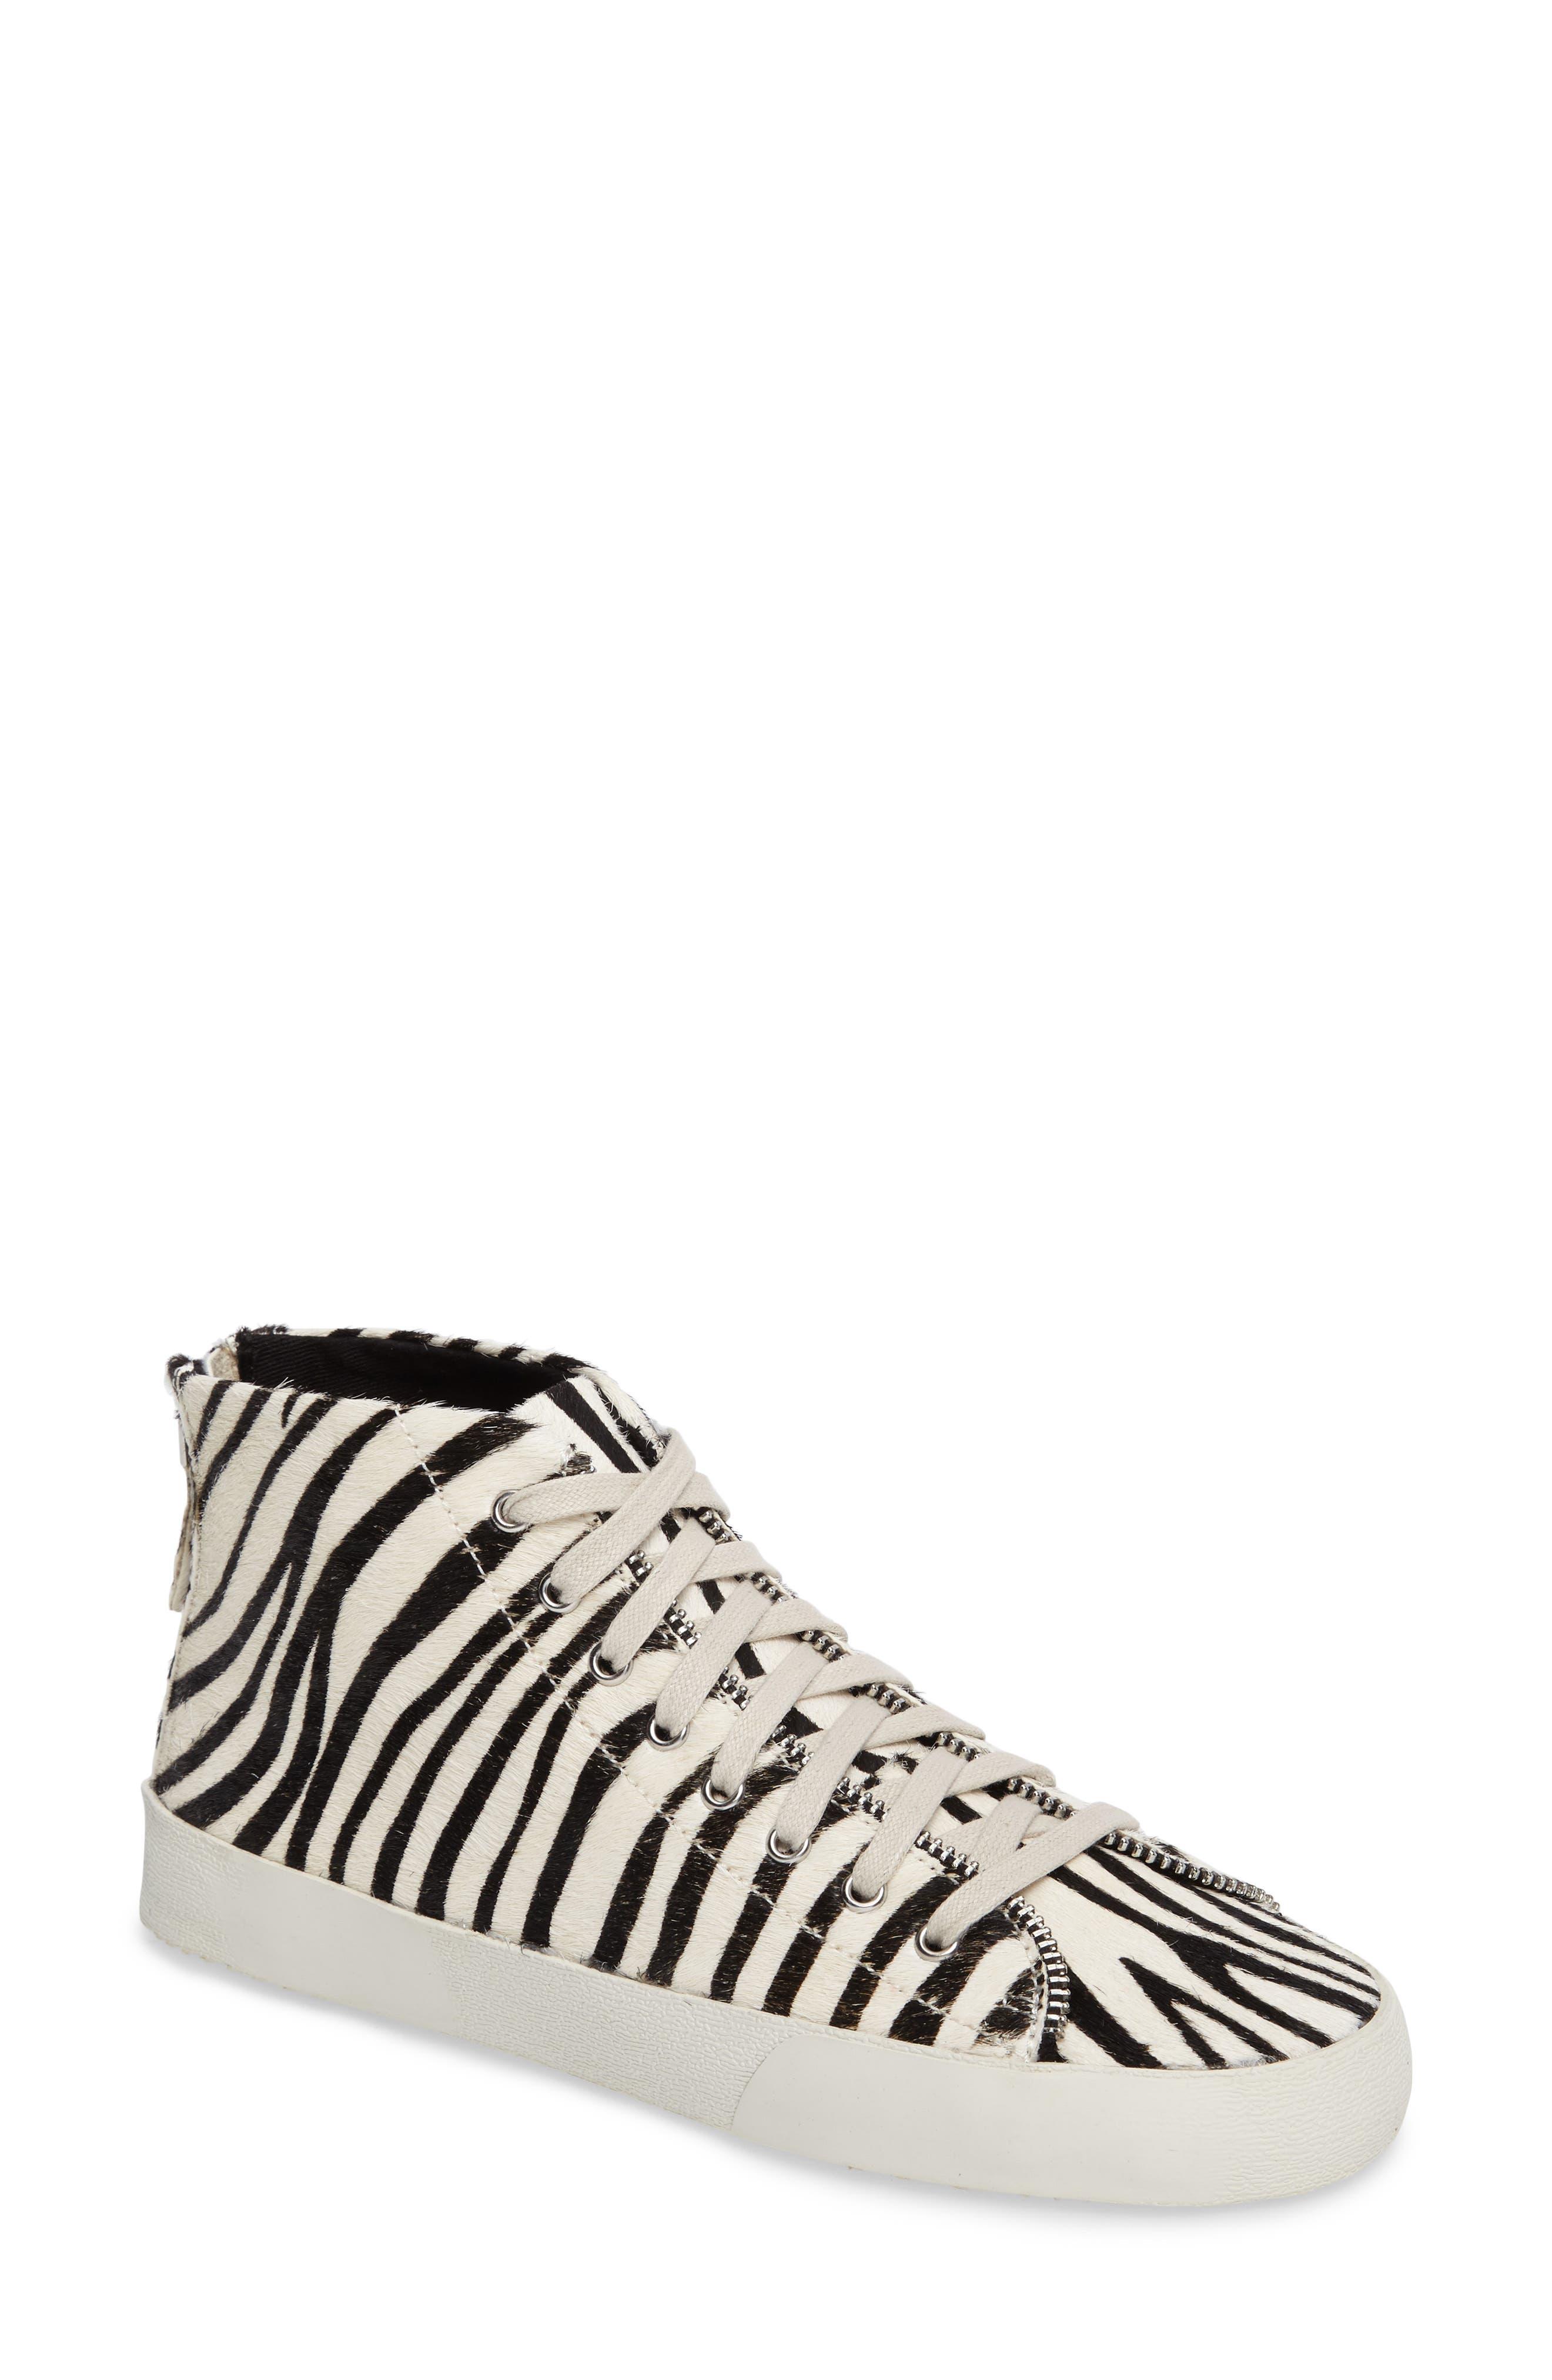 Zaina Too Genuine Calf Hair Sneaker,                         Main,                         color, 100